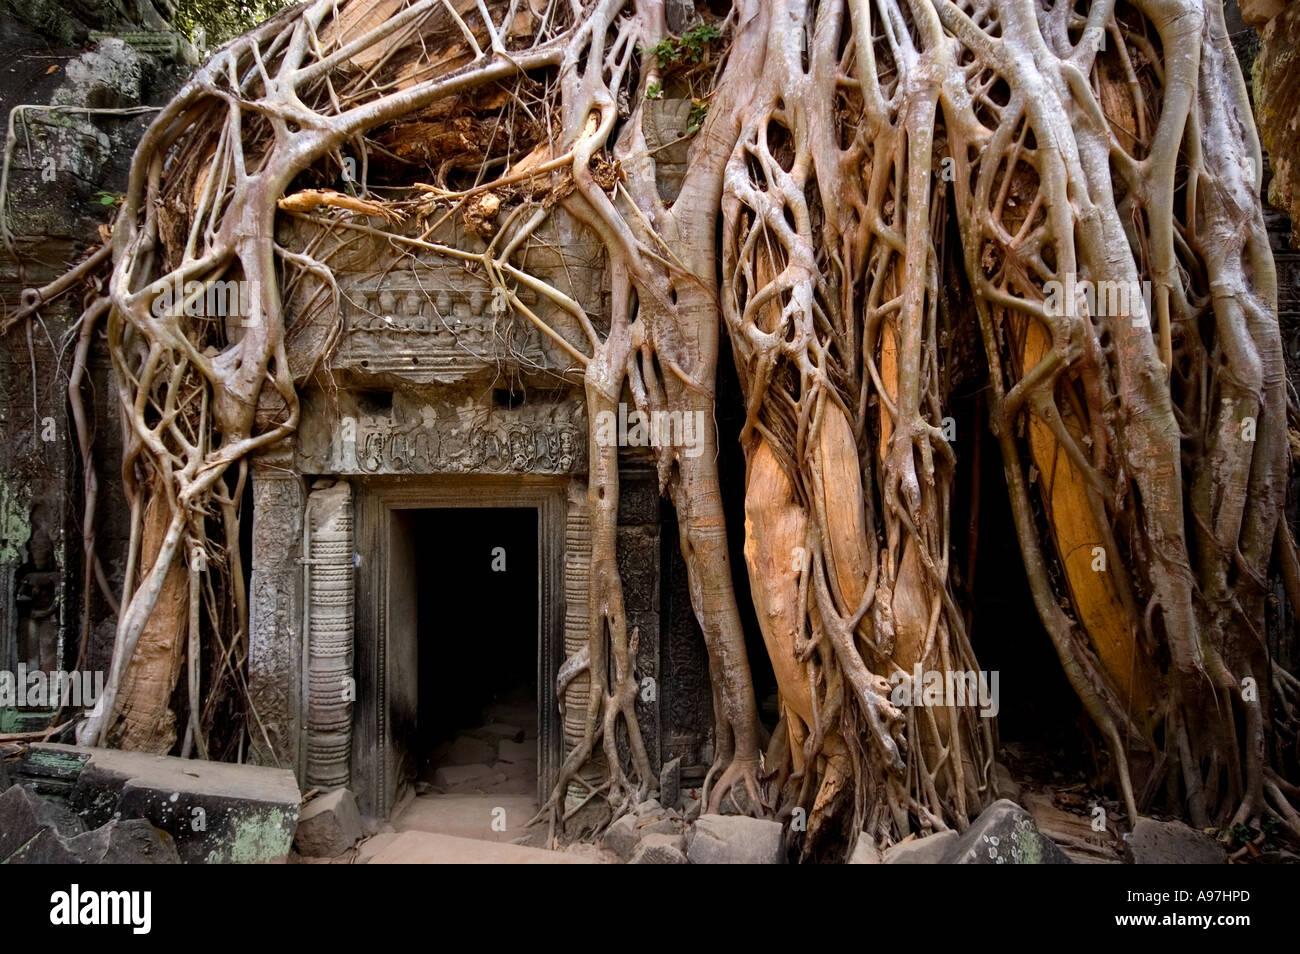 Angkor Wat, Siem Reap, tempio ricoperta da radici di albero Immagini Stock